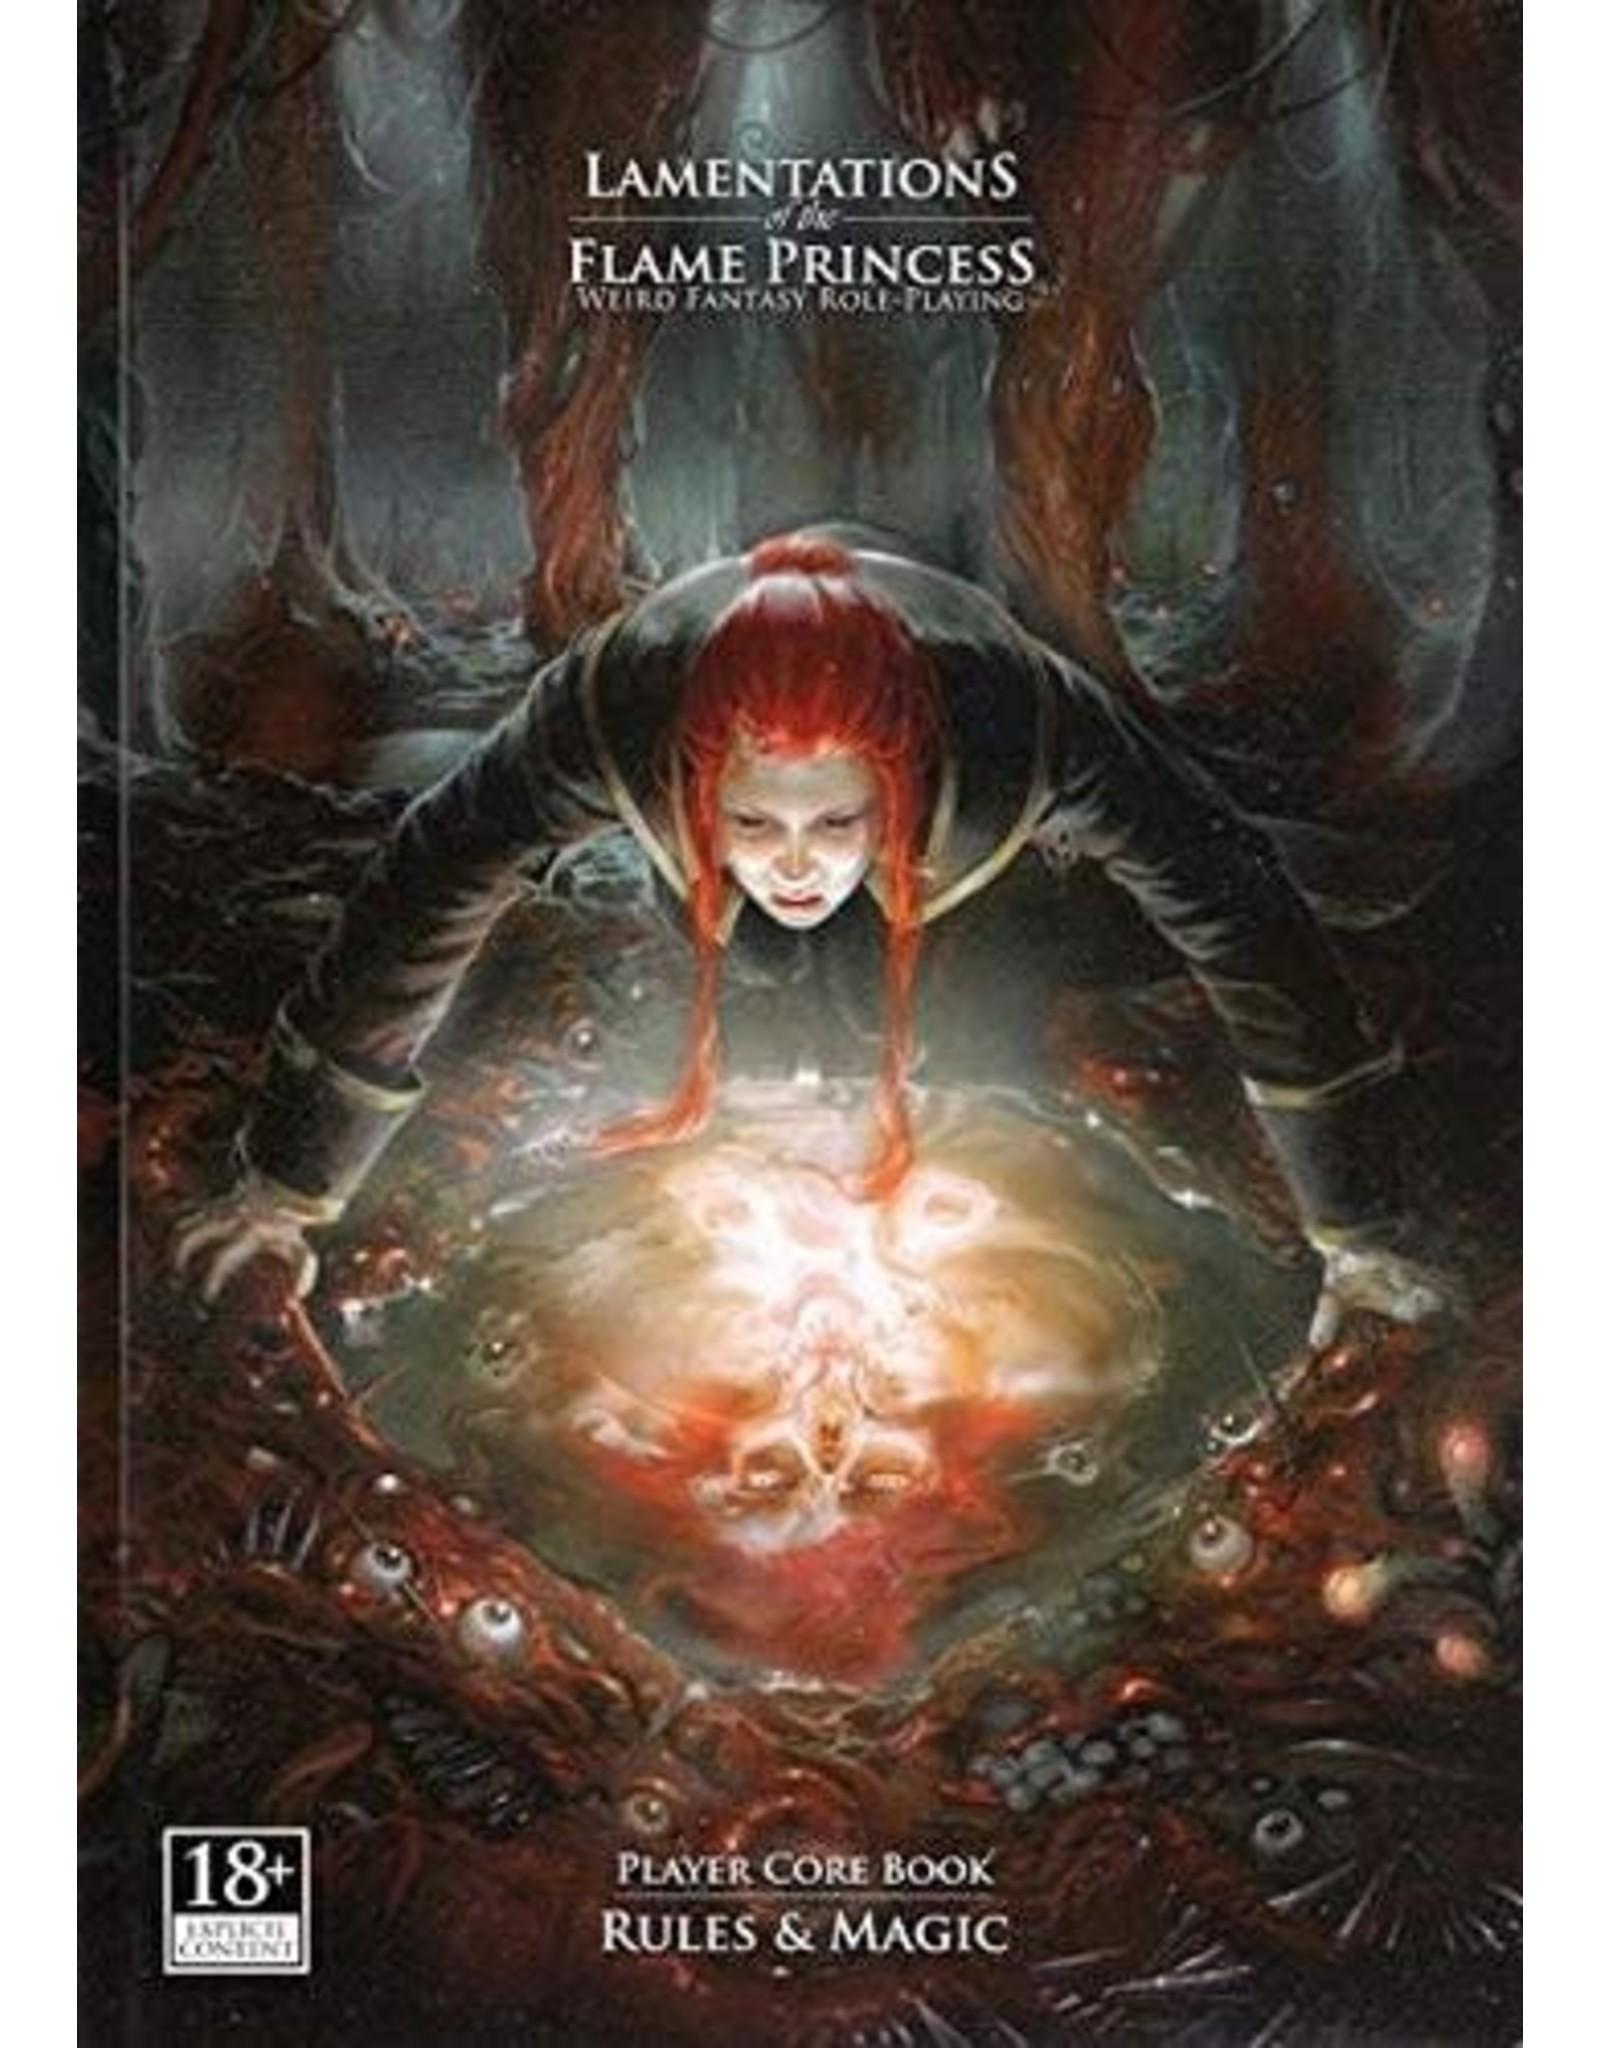 Lamentations of the Flame Princess RPG Core Rulebook